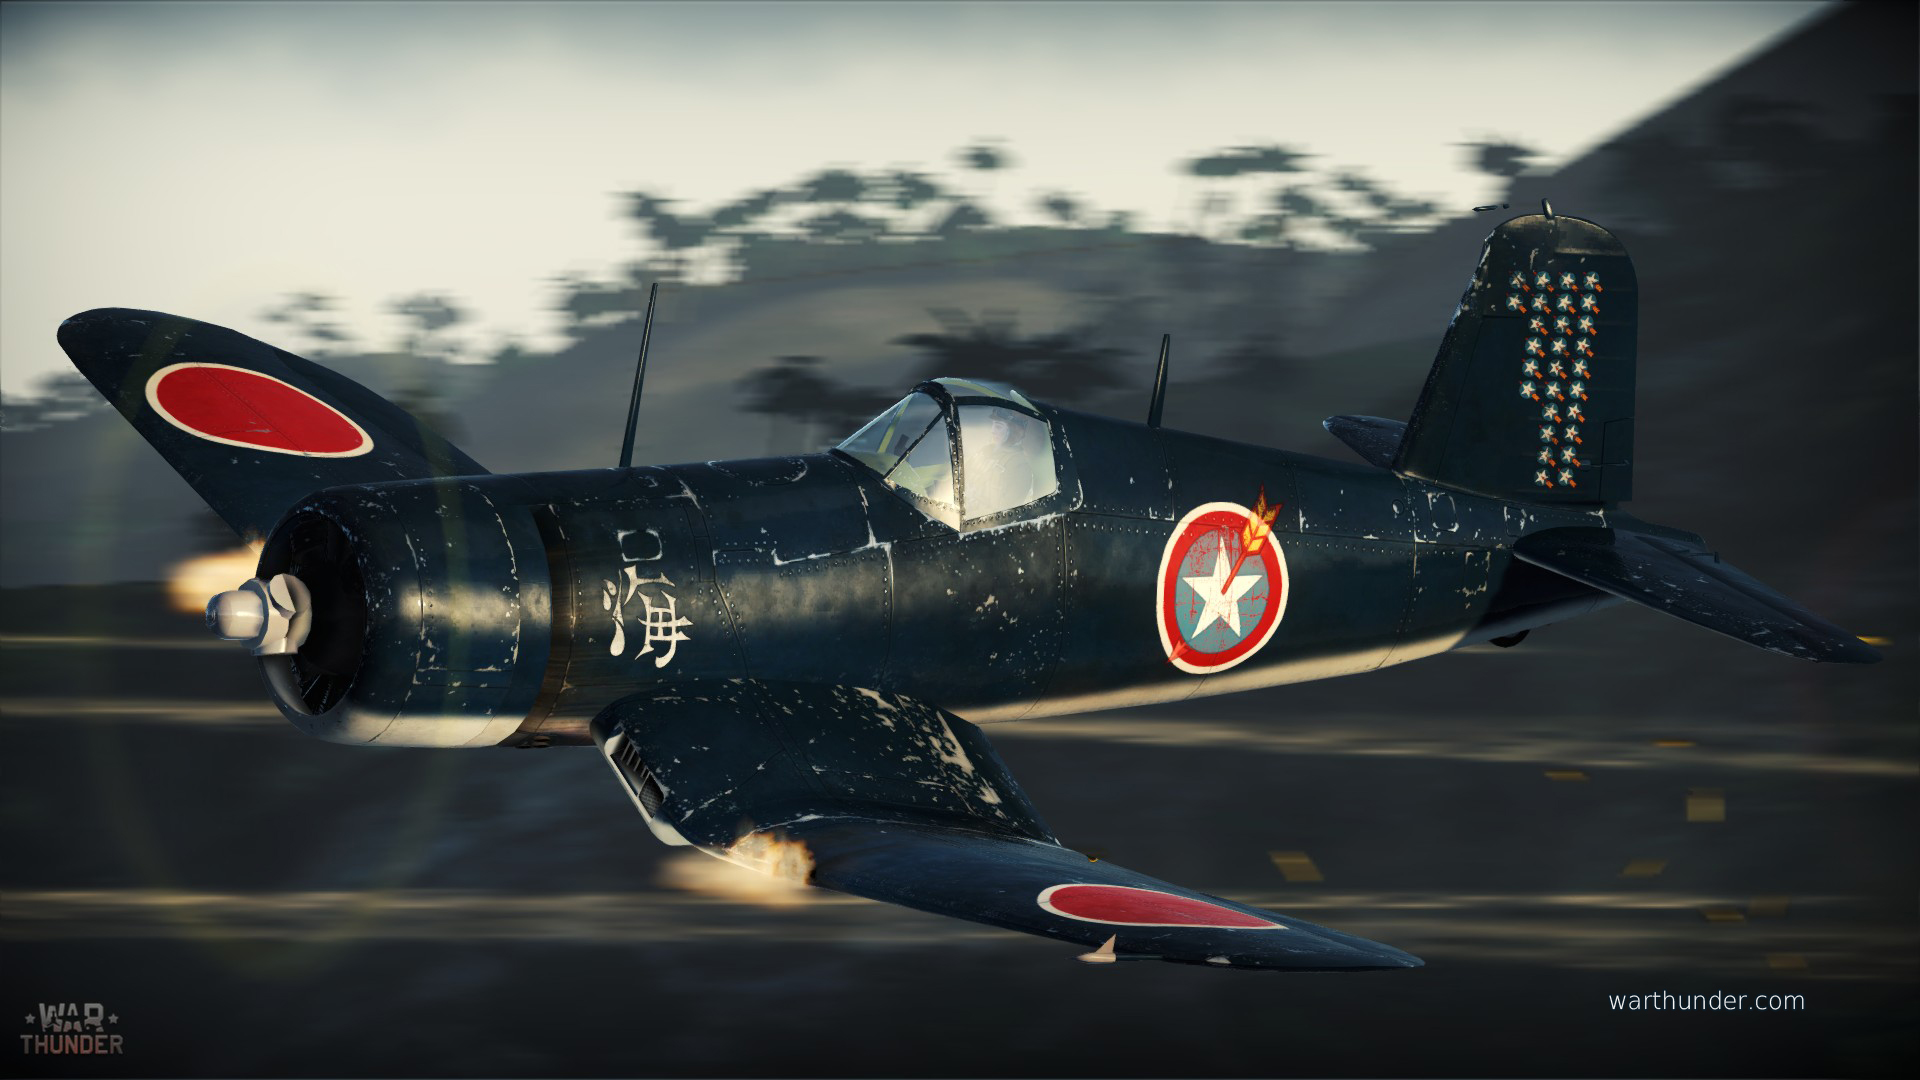 Leopard 1 war thunder gameplay pc capture free